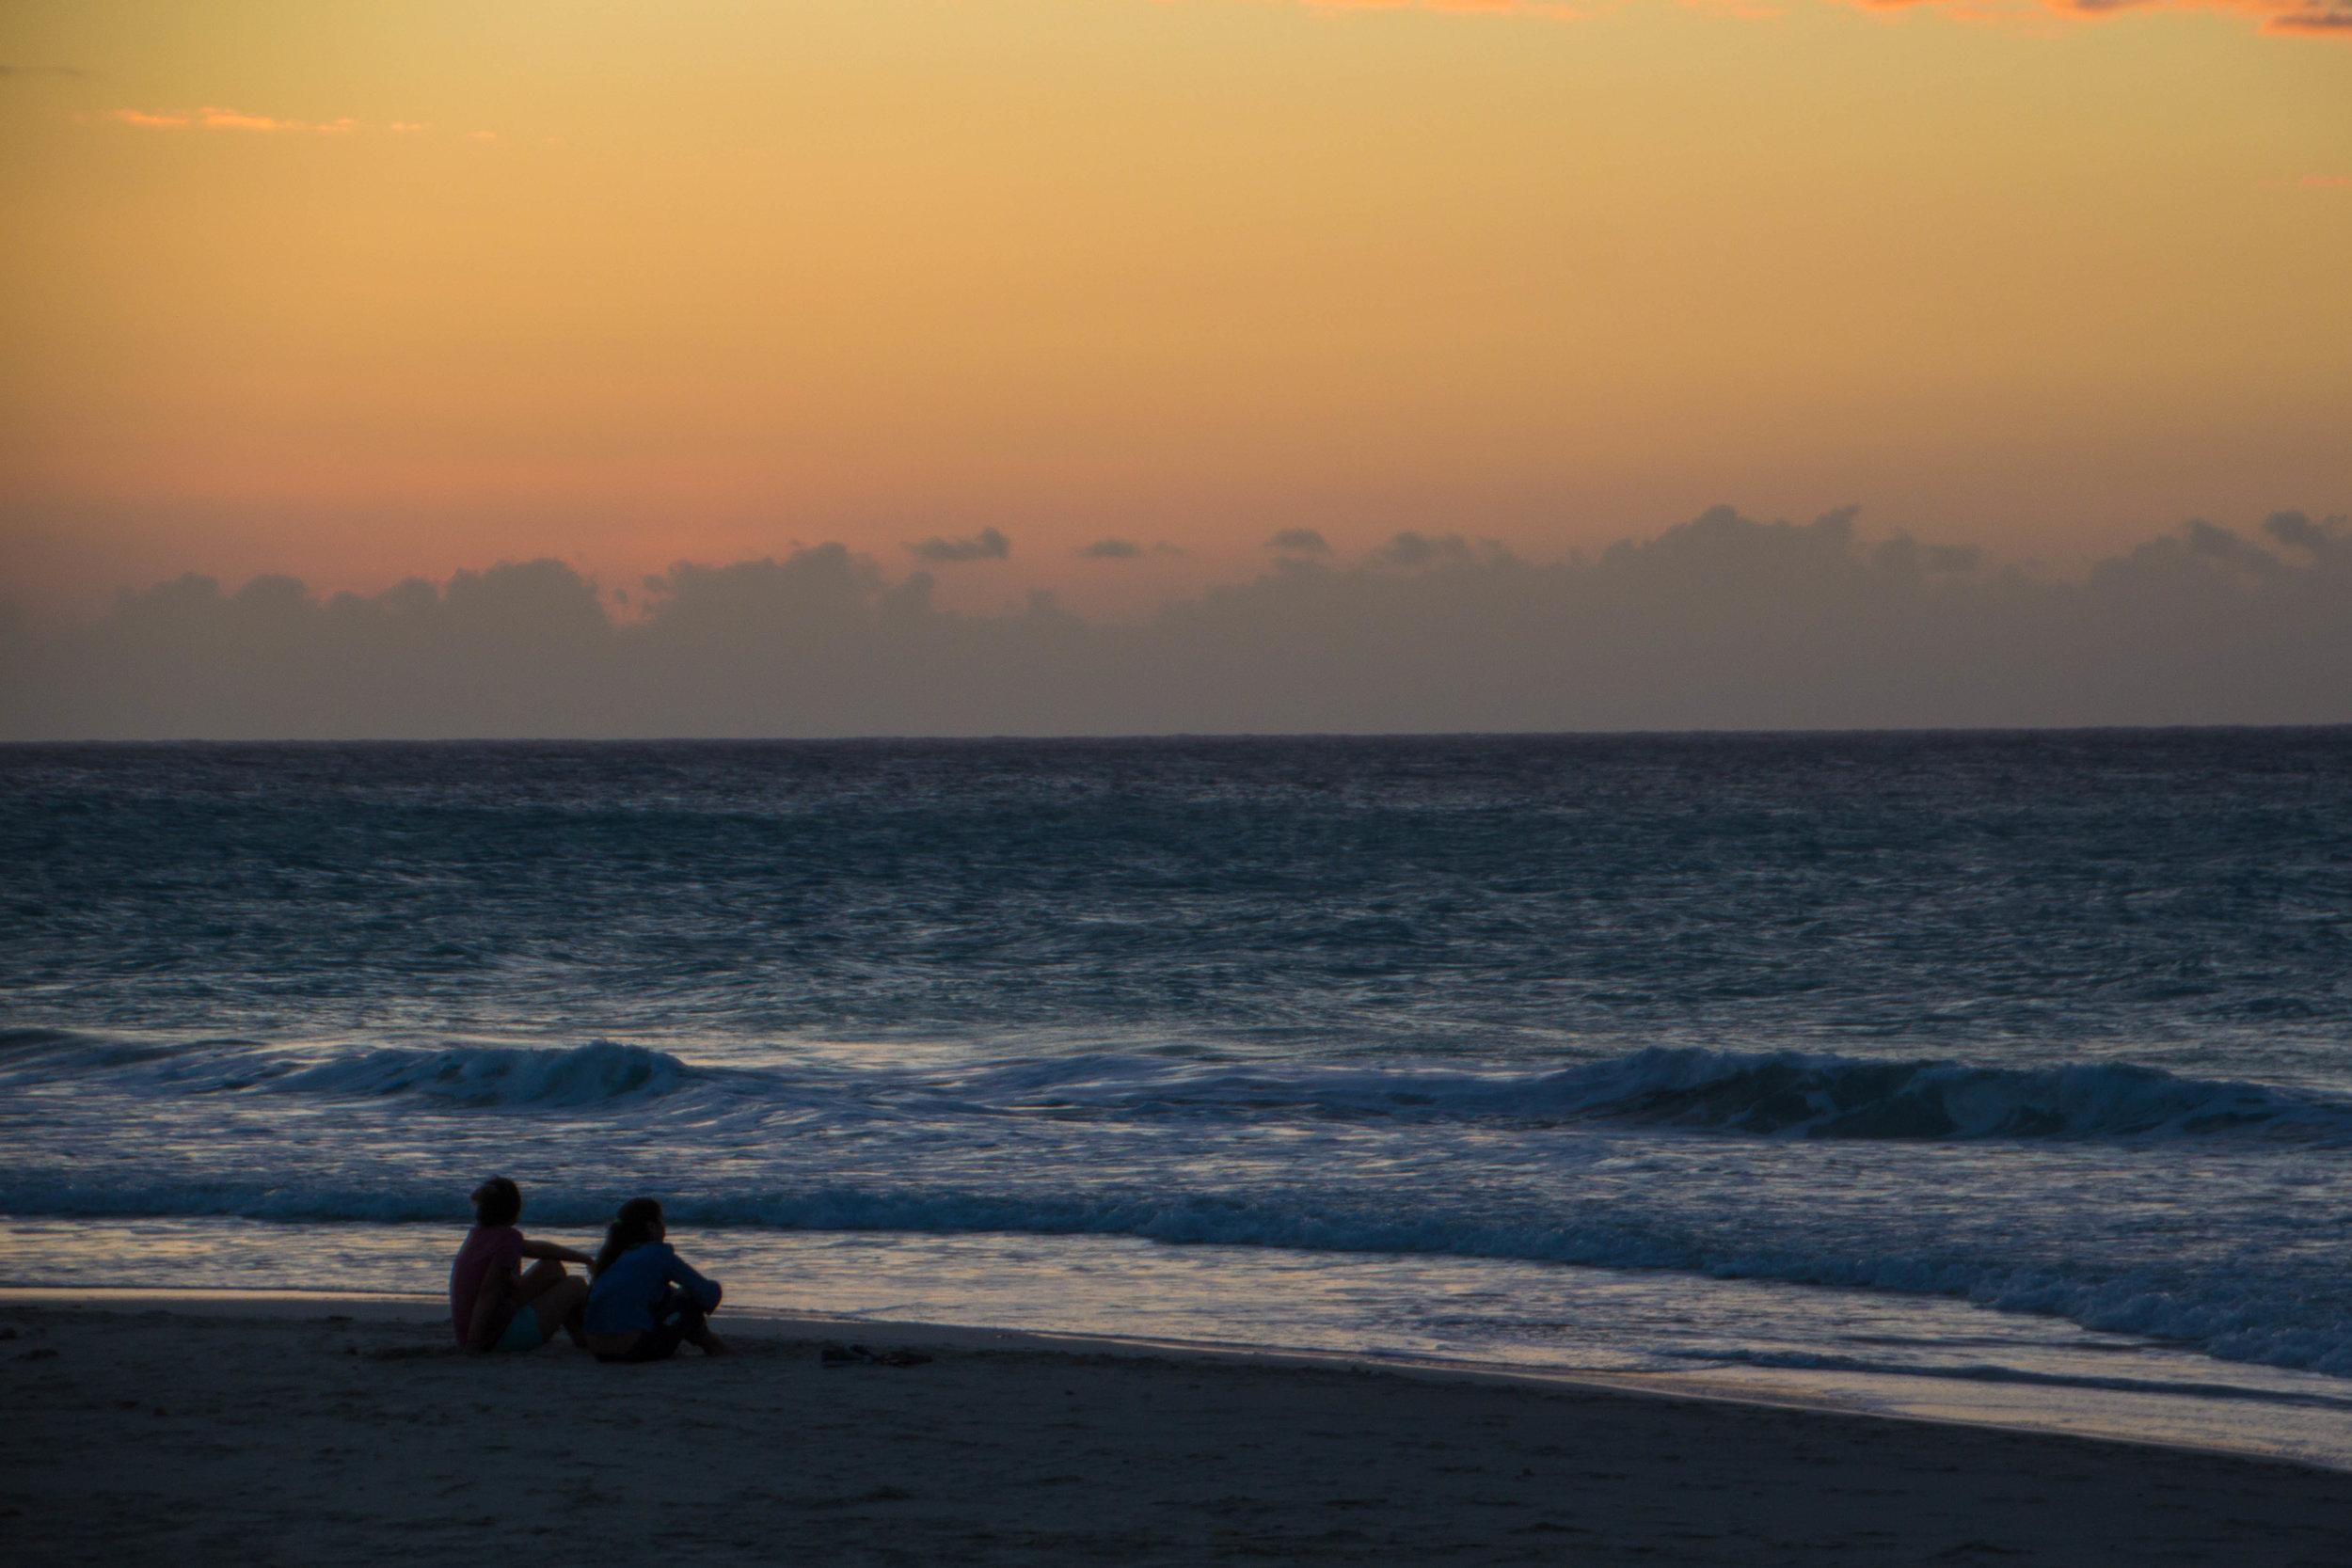 beaches varadero cuba sunset-1-6-2.jpg